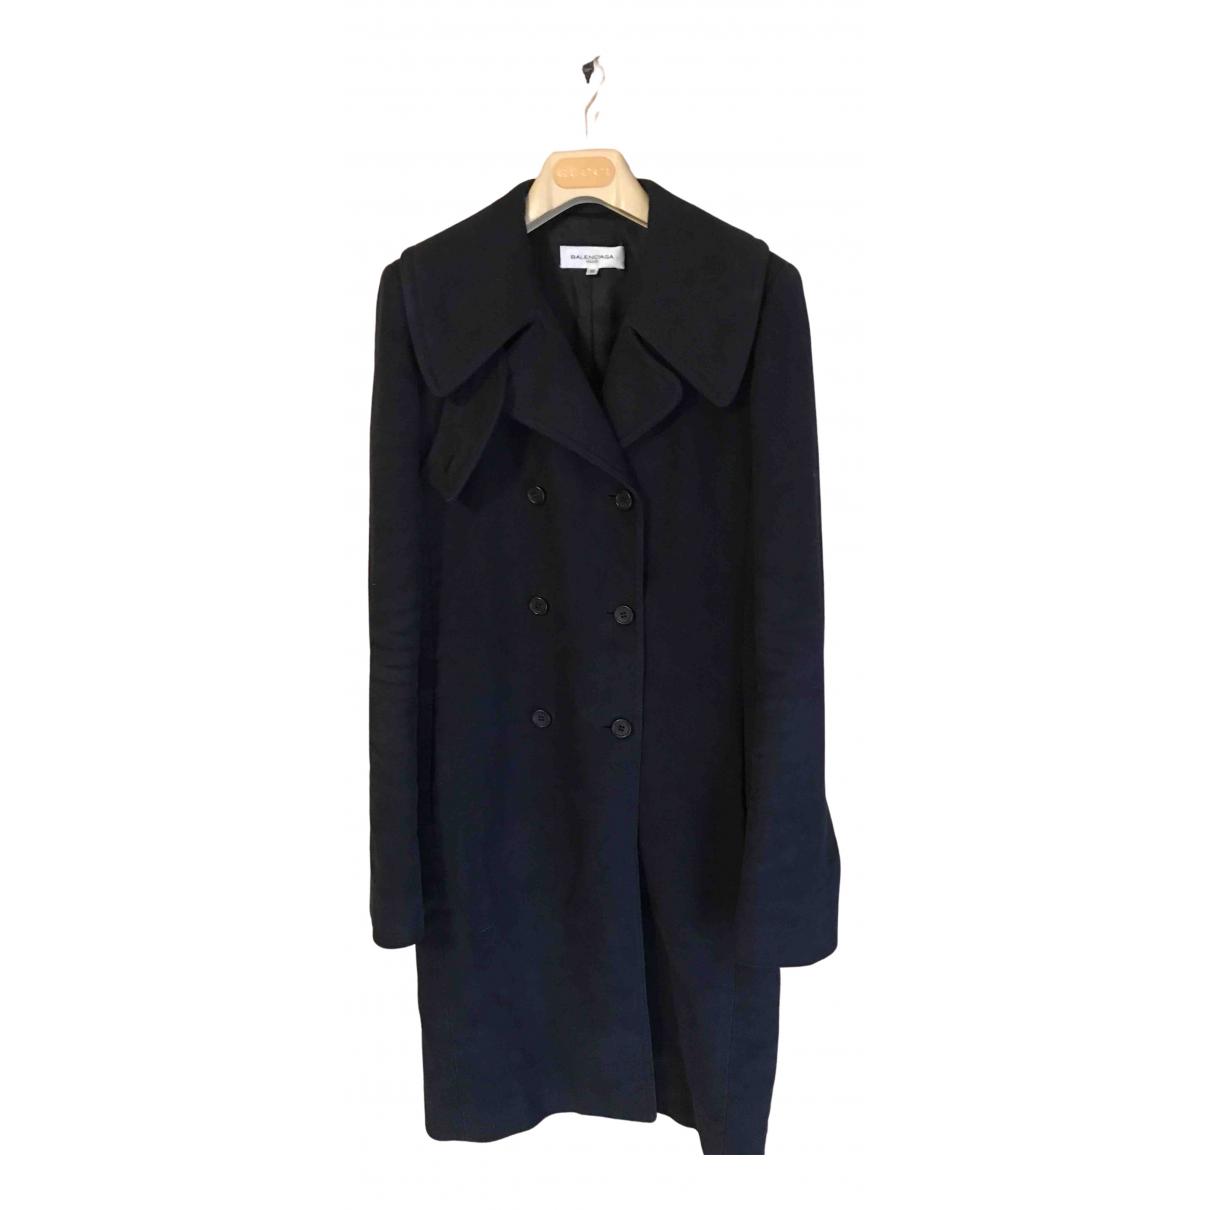 Balenciaga N Black Cotton coat for Women 36 FR